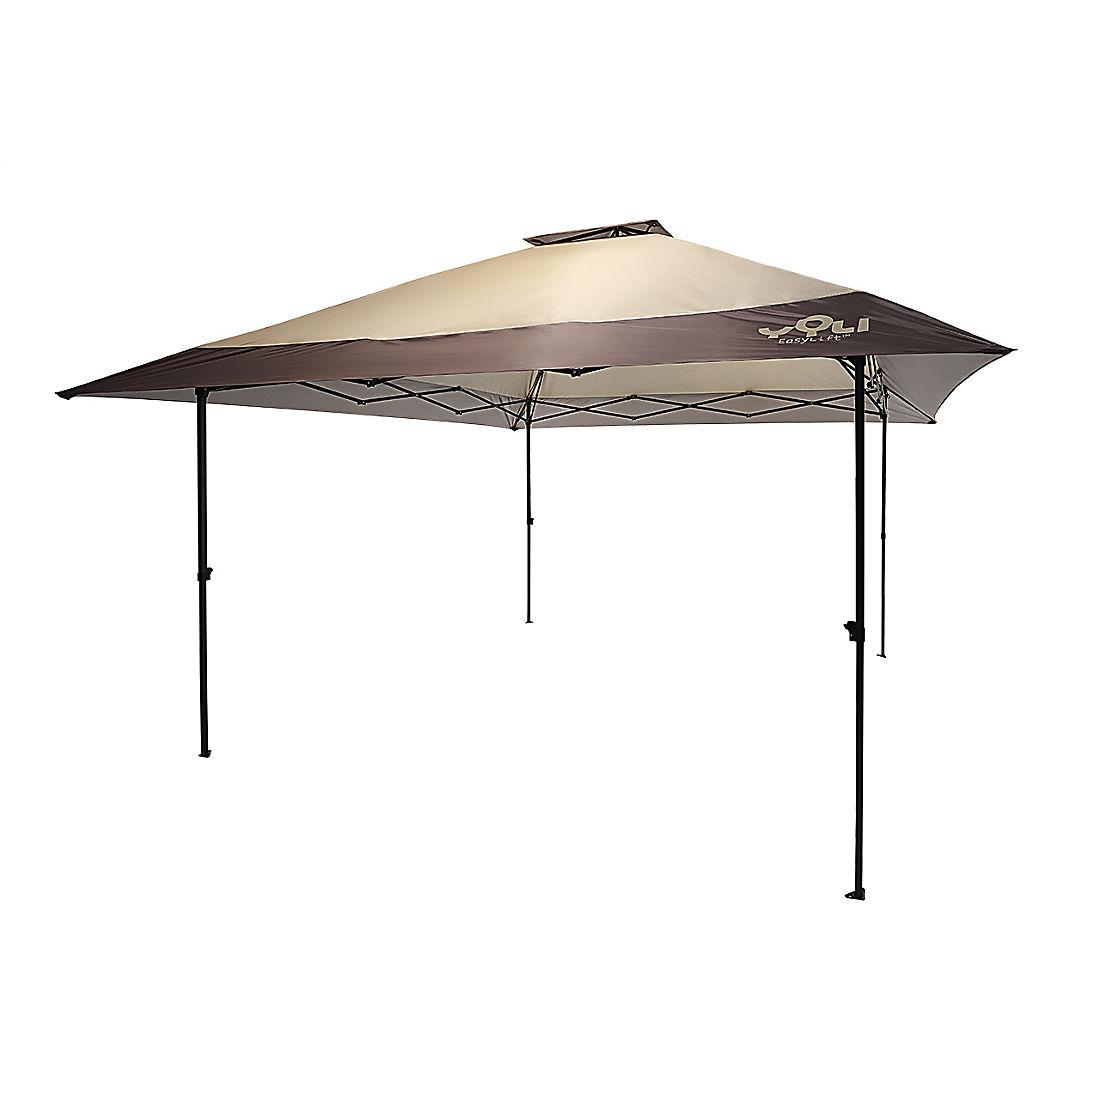 YOLI Pagoda 170 13' x 13' Instant Canopy with EasyLift